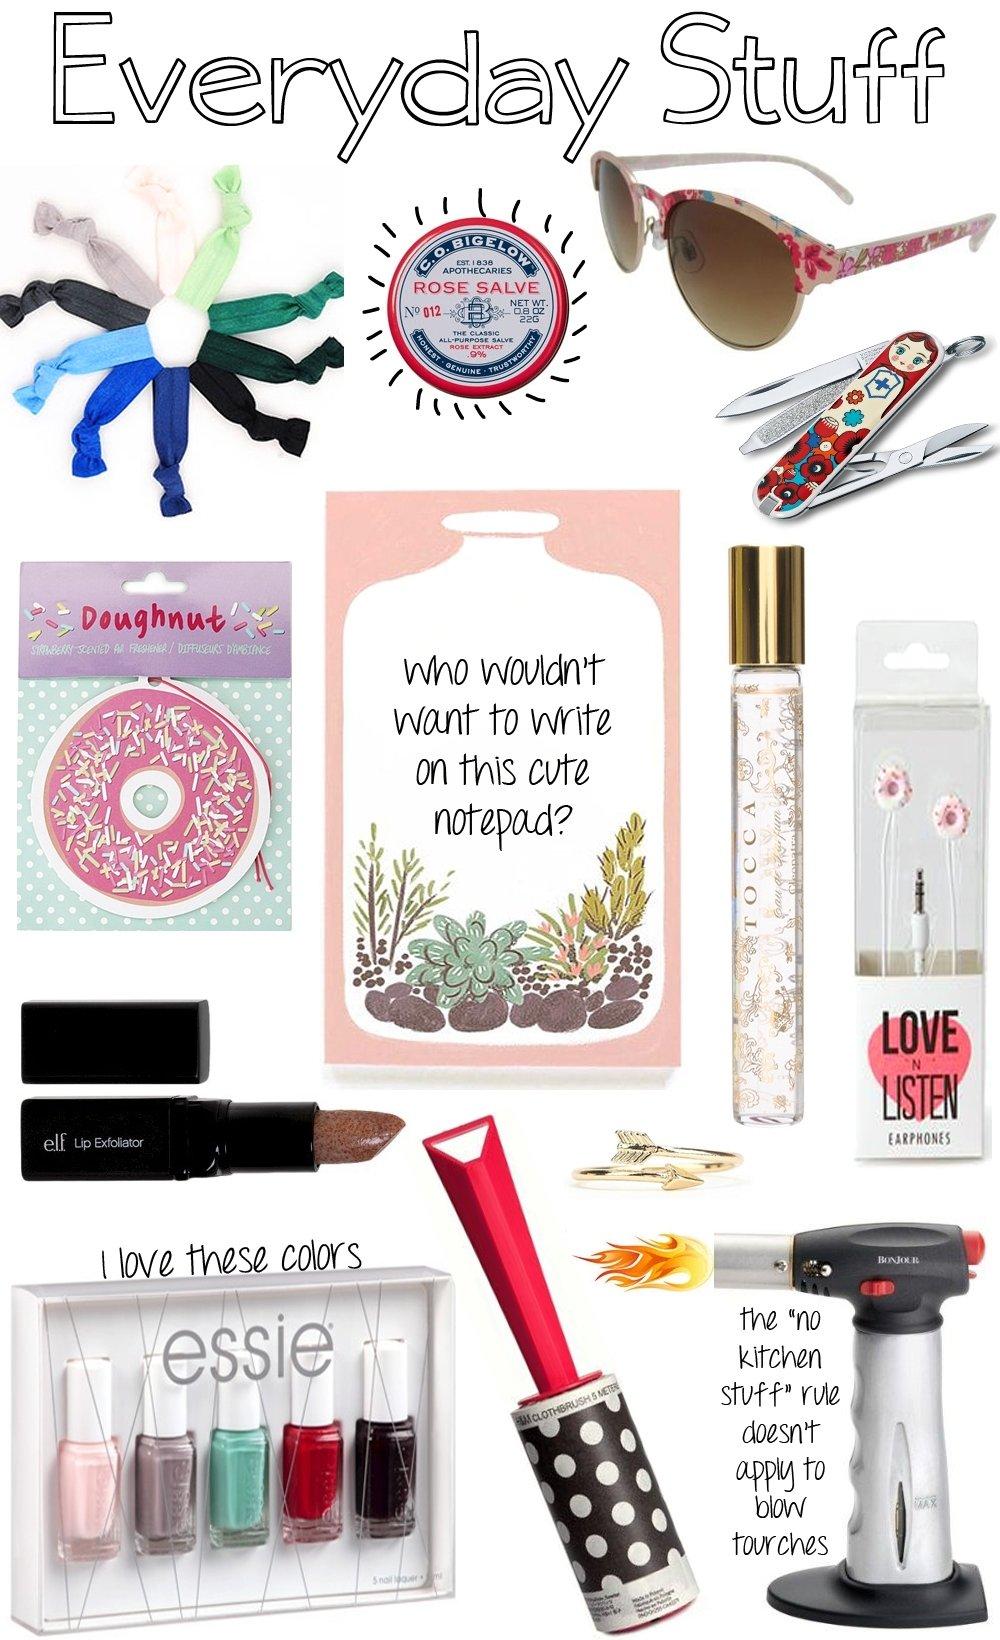 10 Wonderful Stocking Stuffer Ideas For Girlfriend stocking stuffers for her making mondays 1